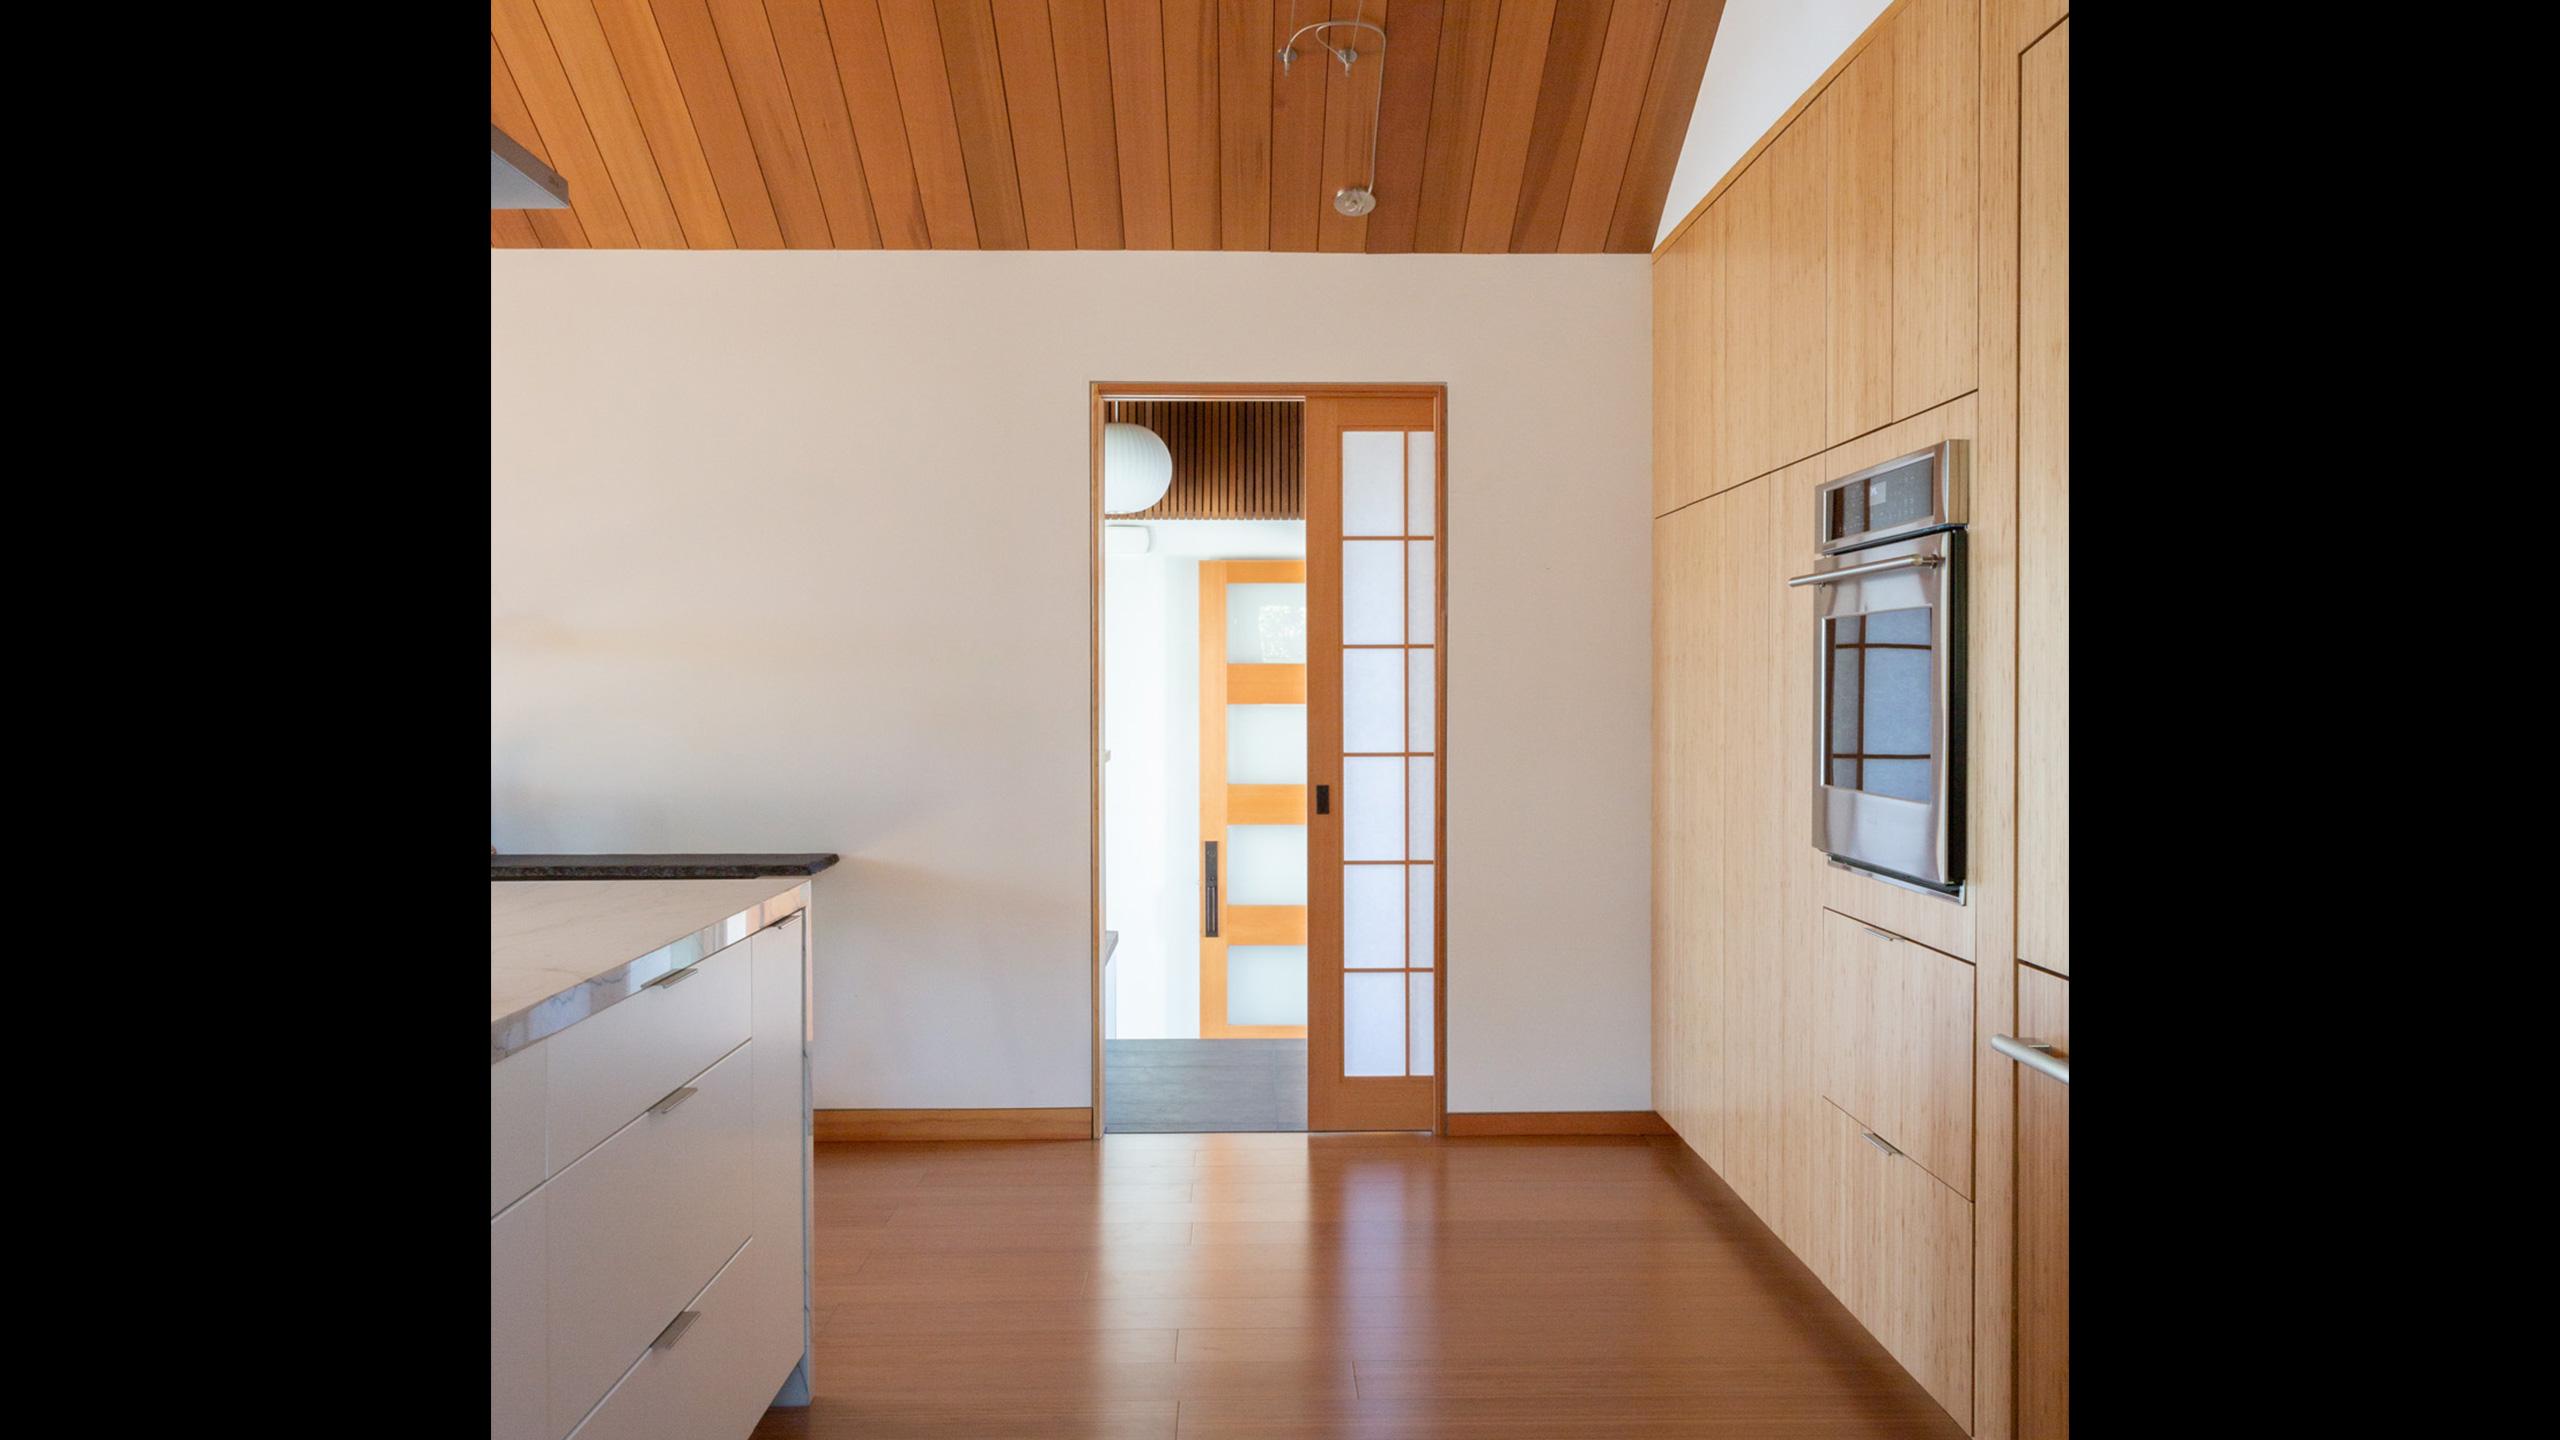 Zen-House-Santa-Rosa-japanes-style-doors